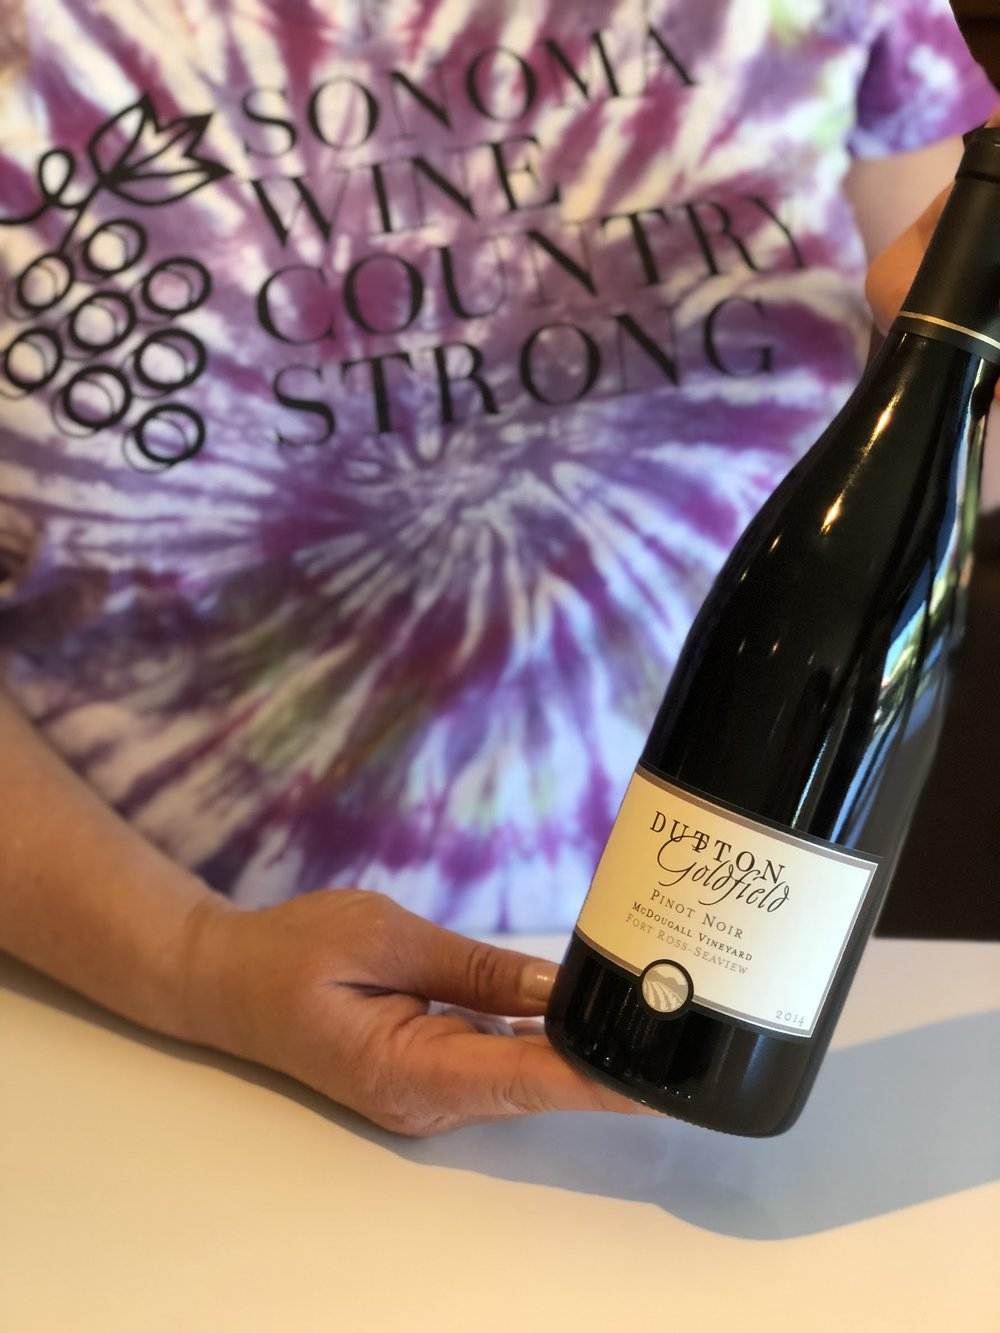 Dutton-Goldfield Pinot